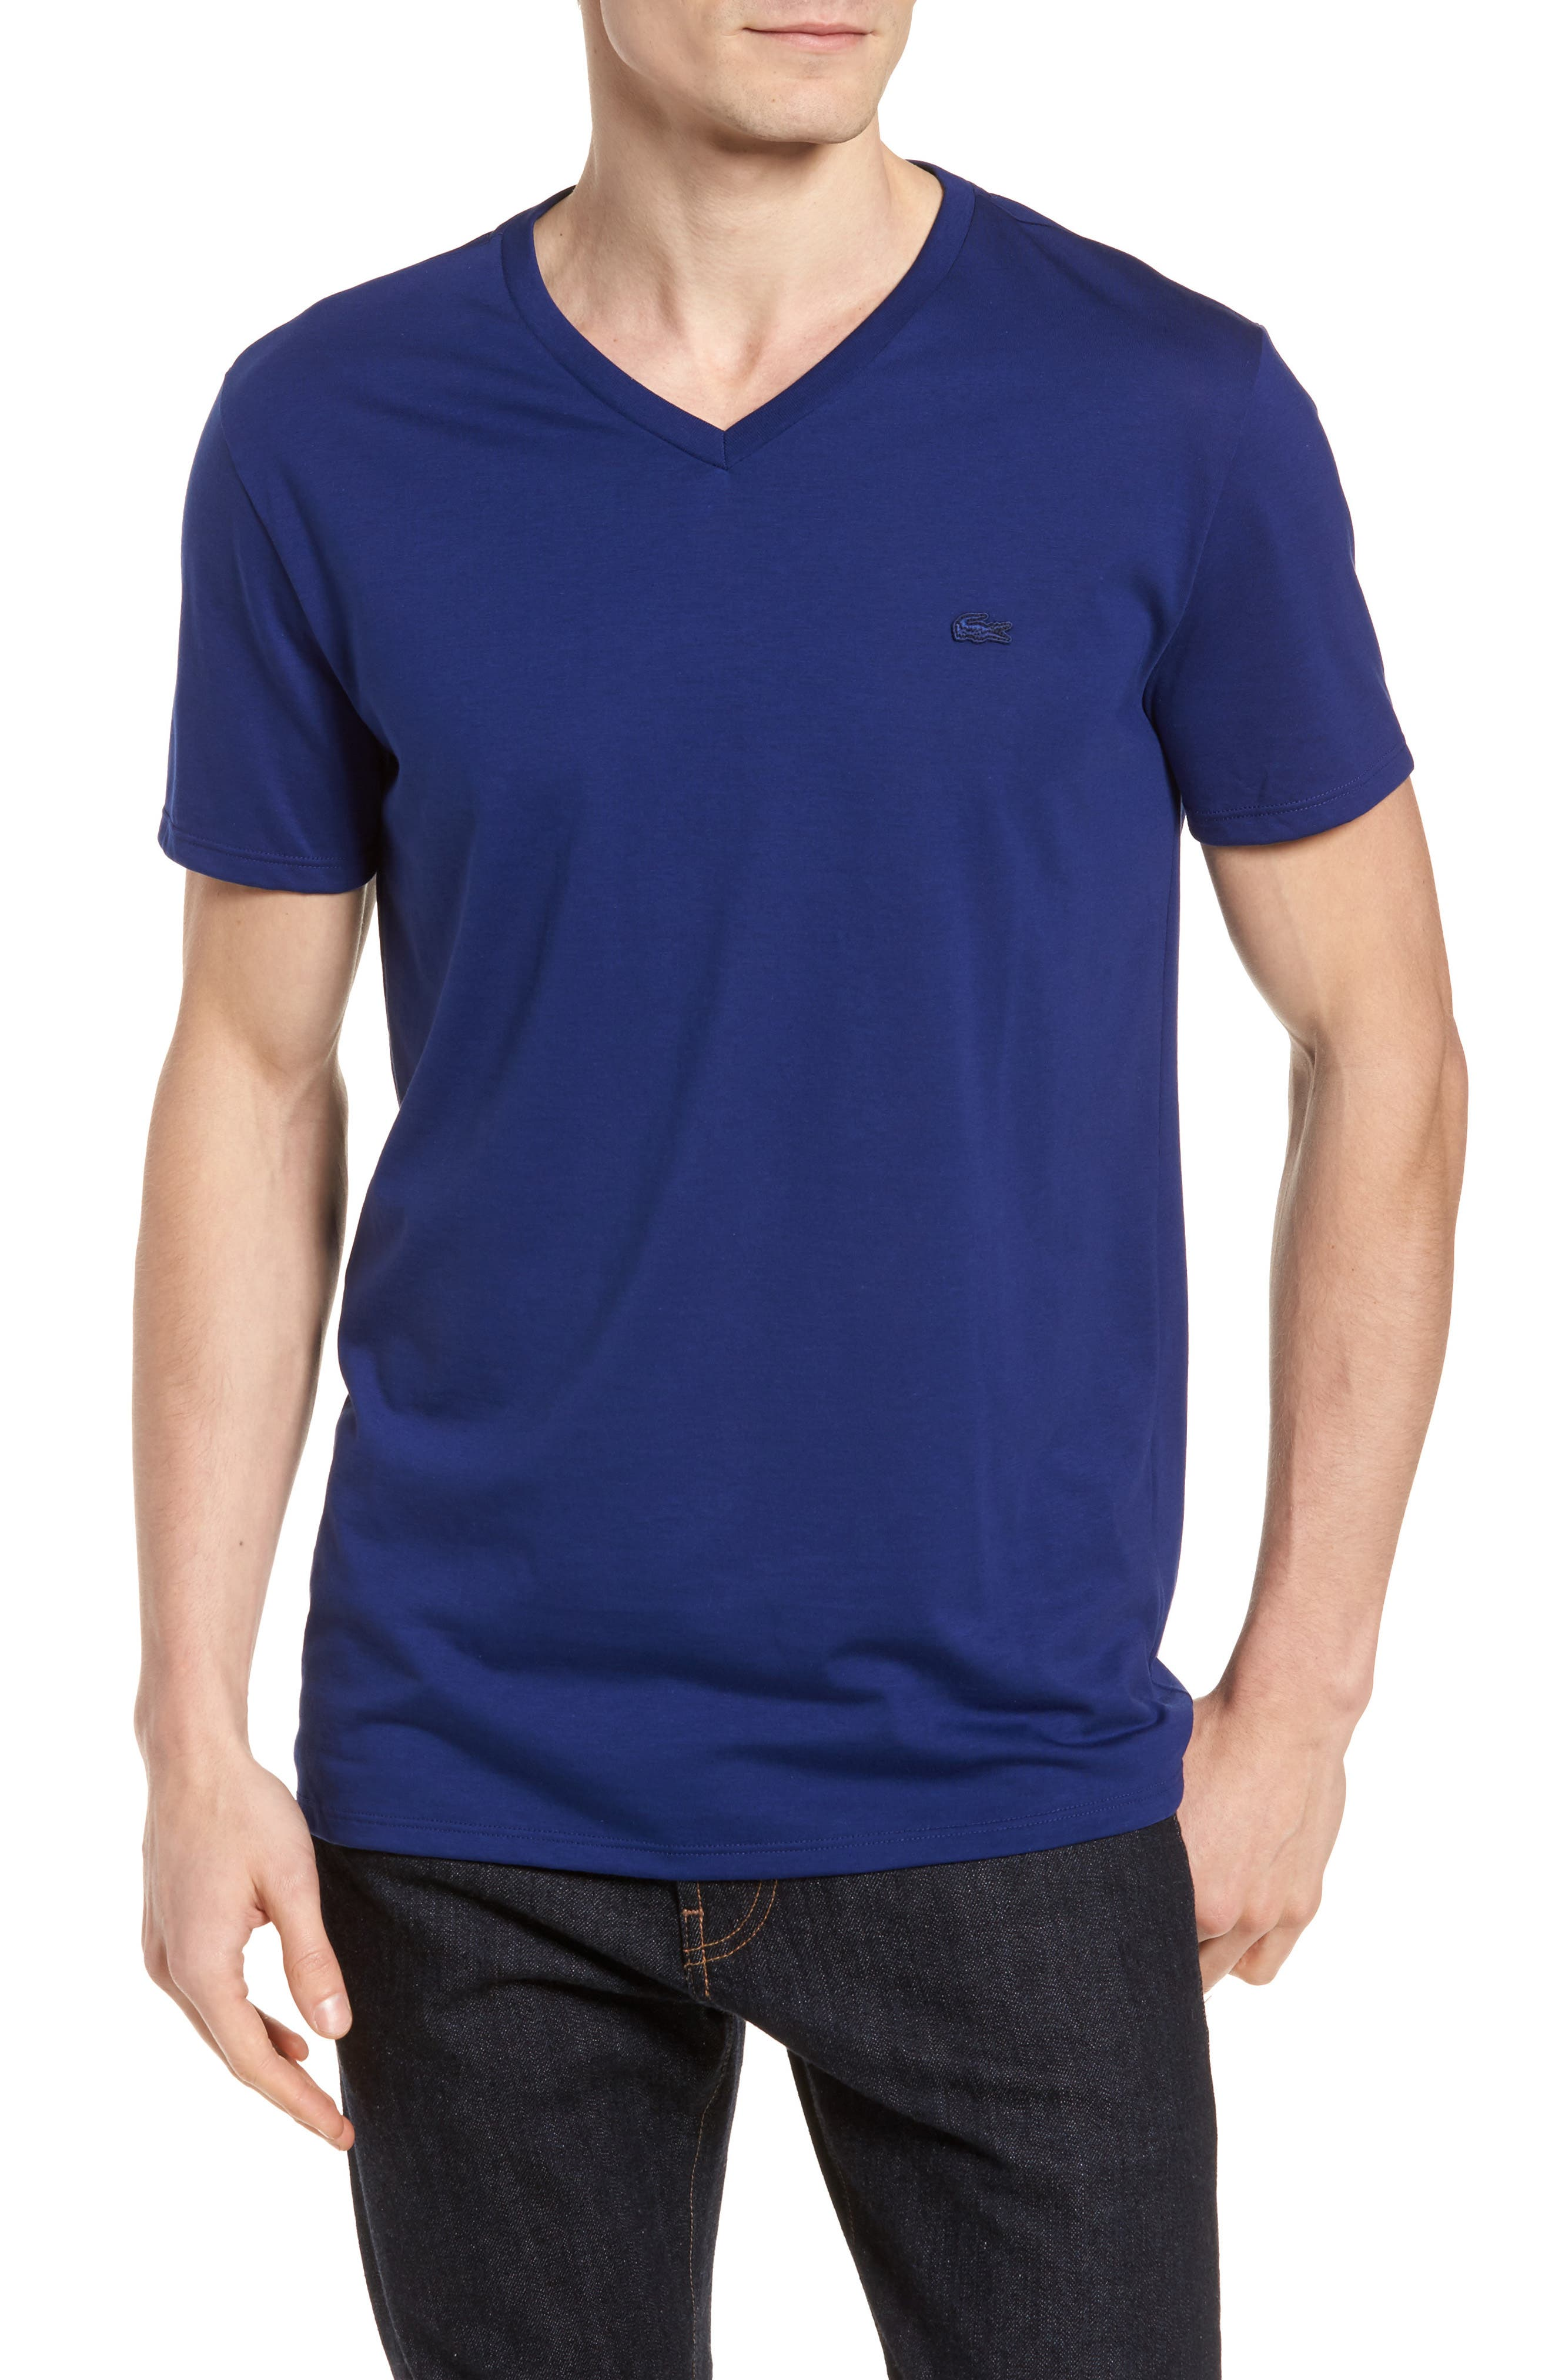 Main Image - Lacoste Pima Cotton T-Shirt (Nordstrom Exclusive)